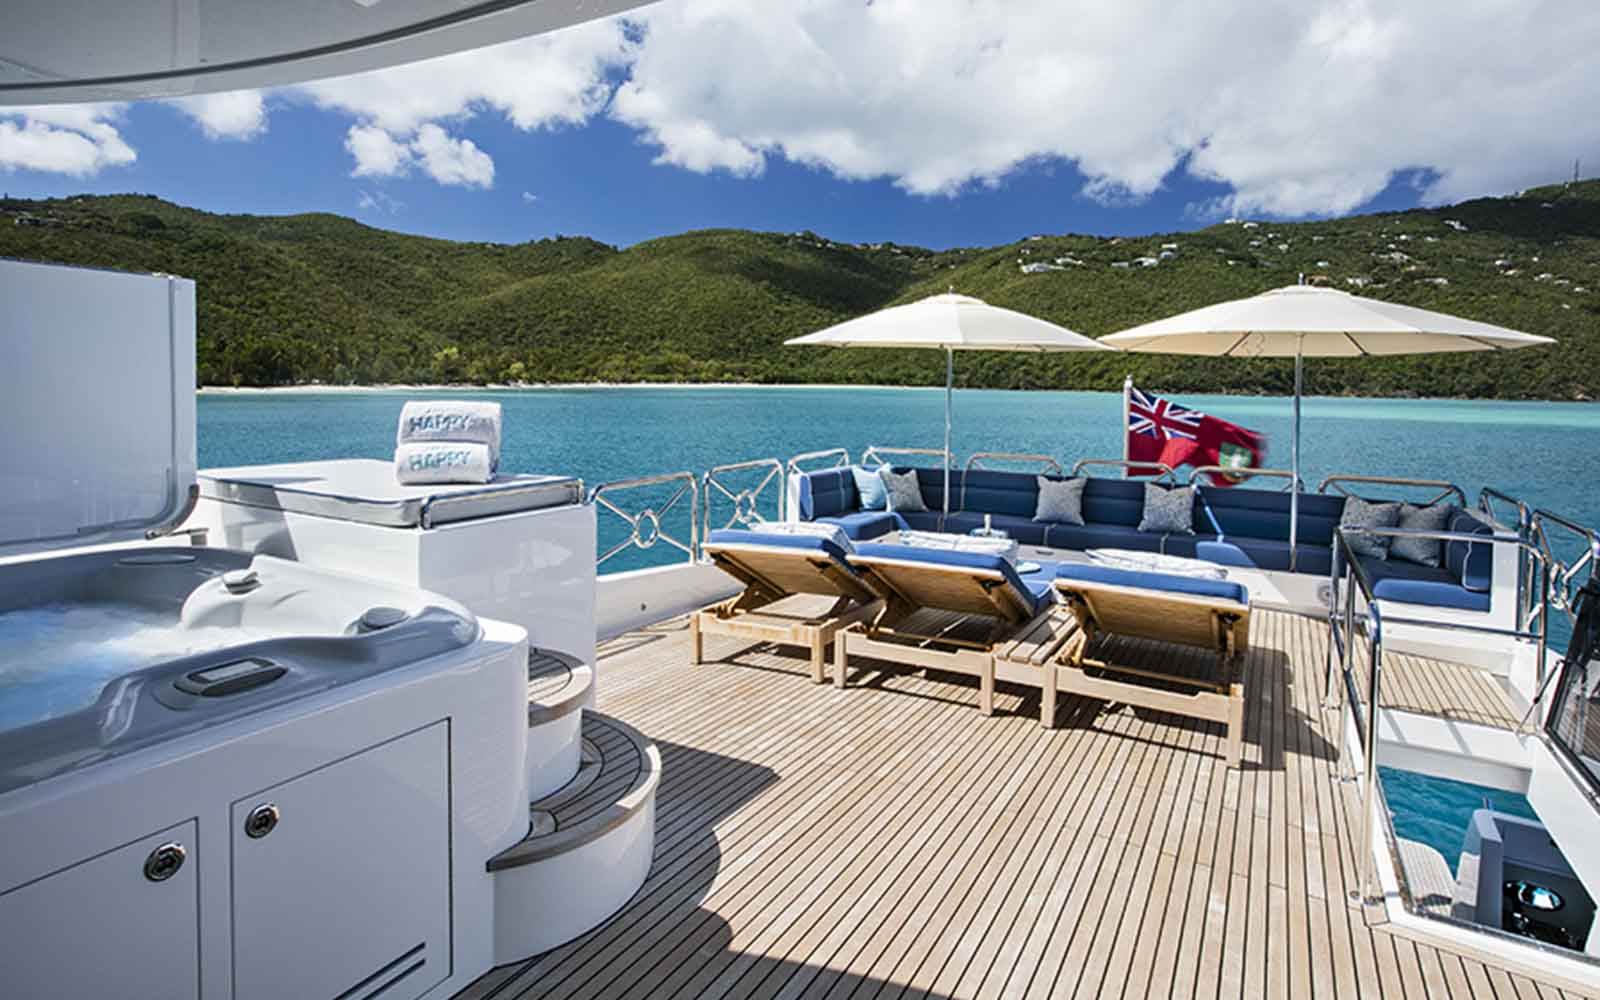 johnson 110 skylounge deck - boat shopping